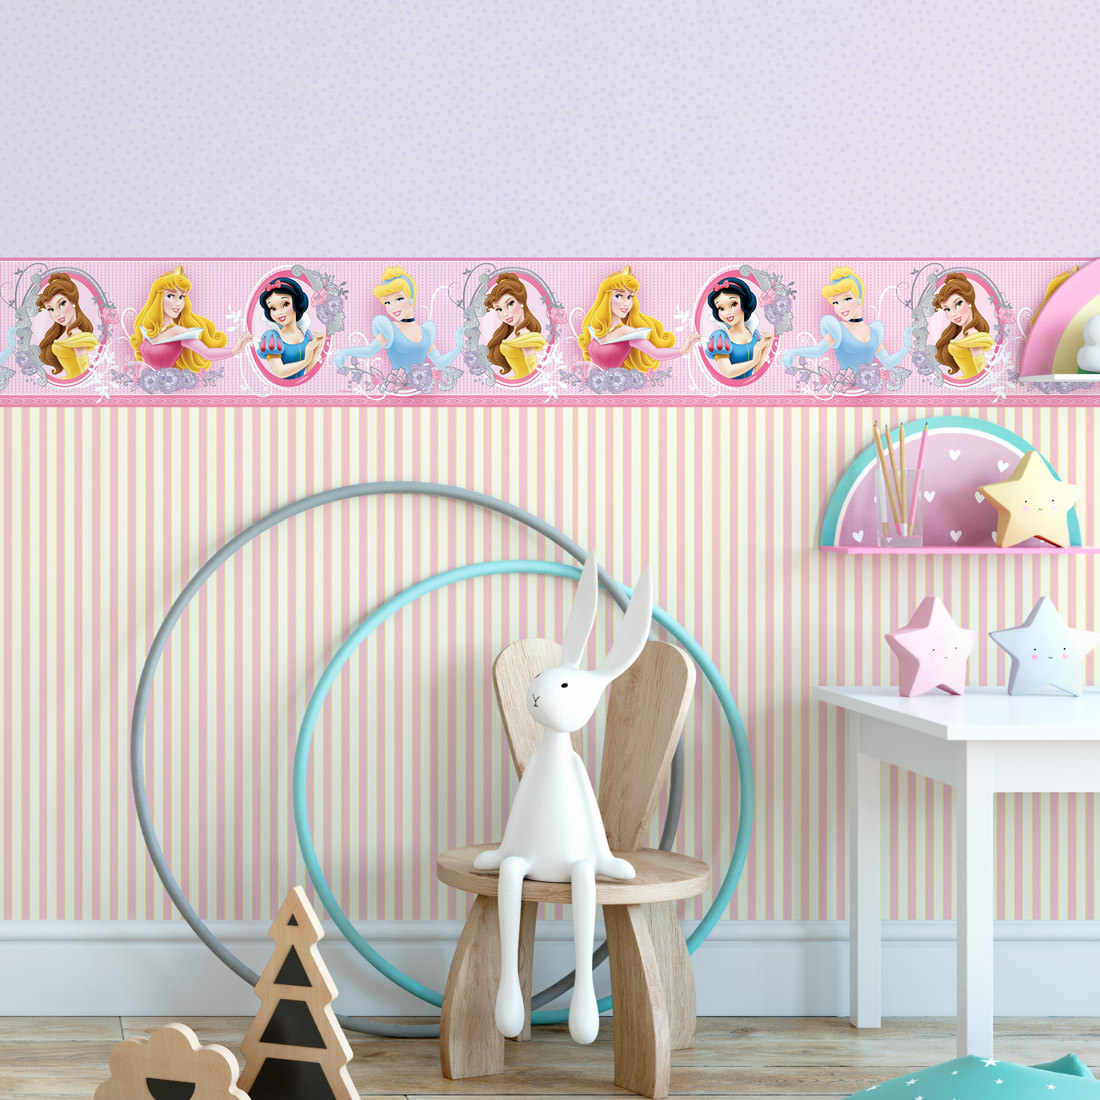 Faixa Decorativa Infantil Princesas - Disney